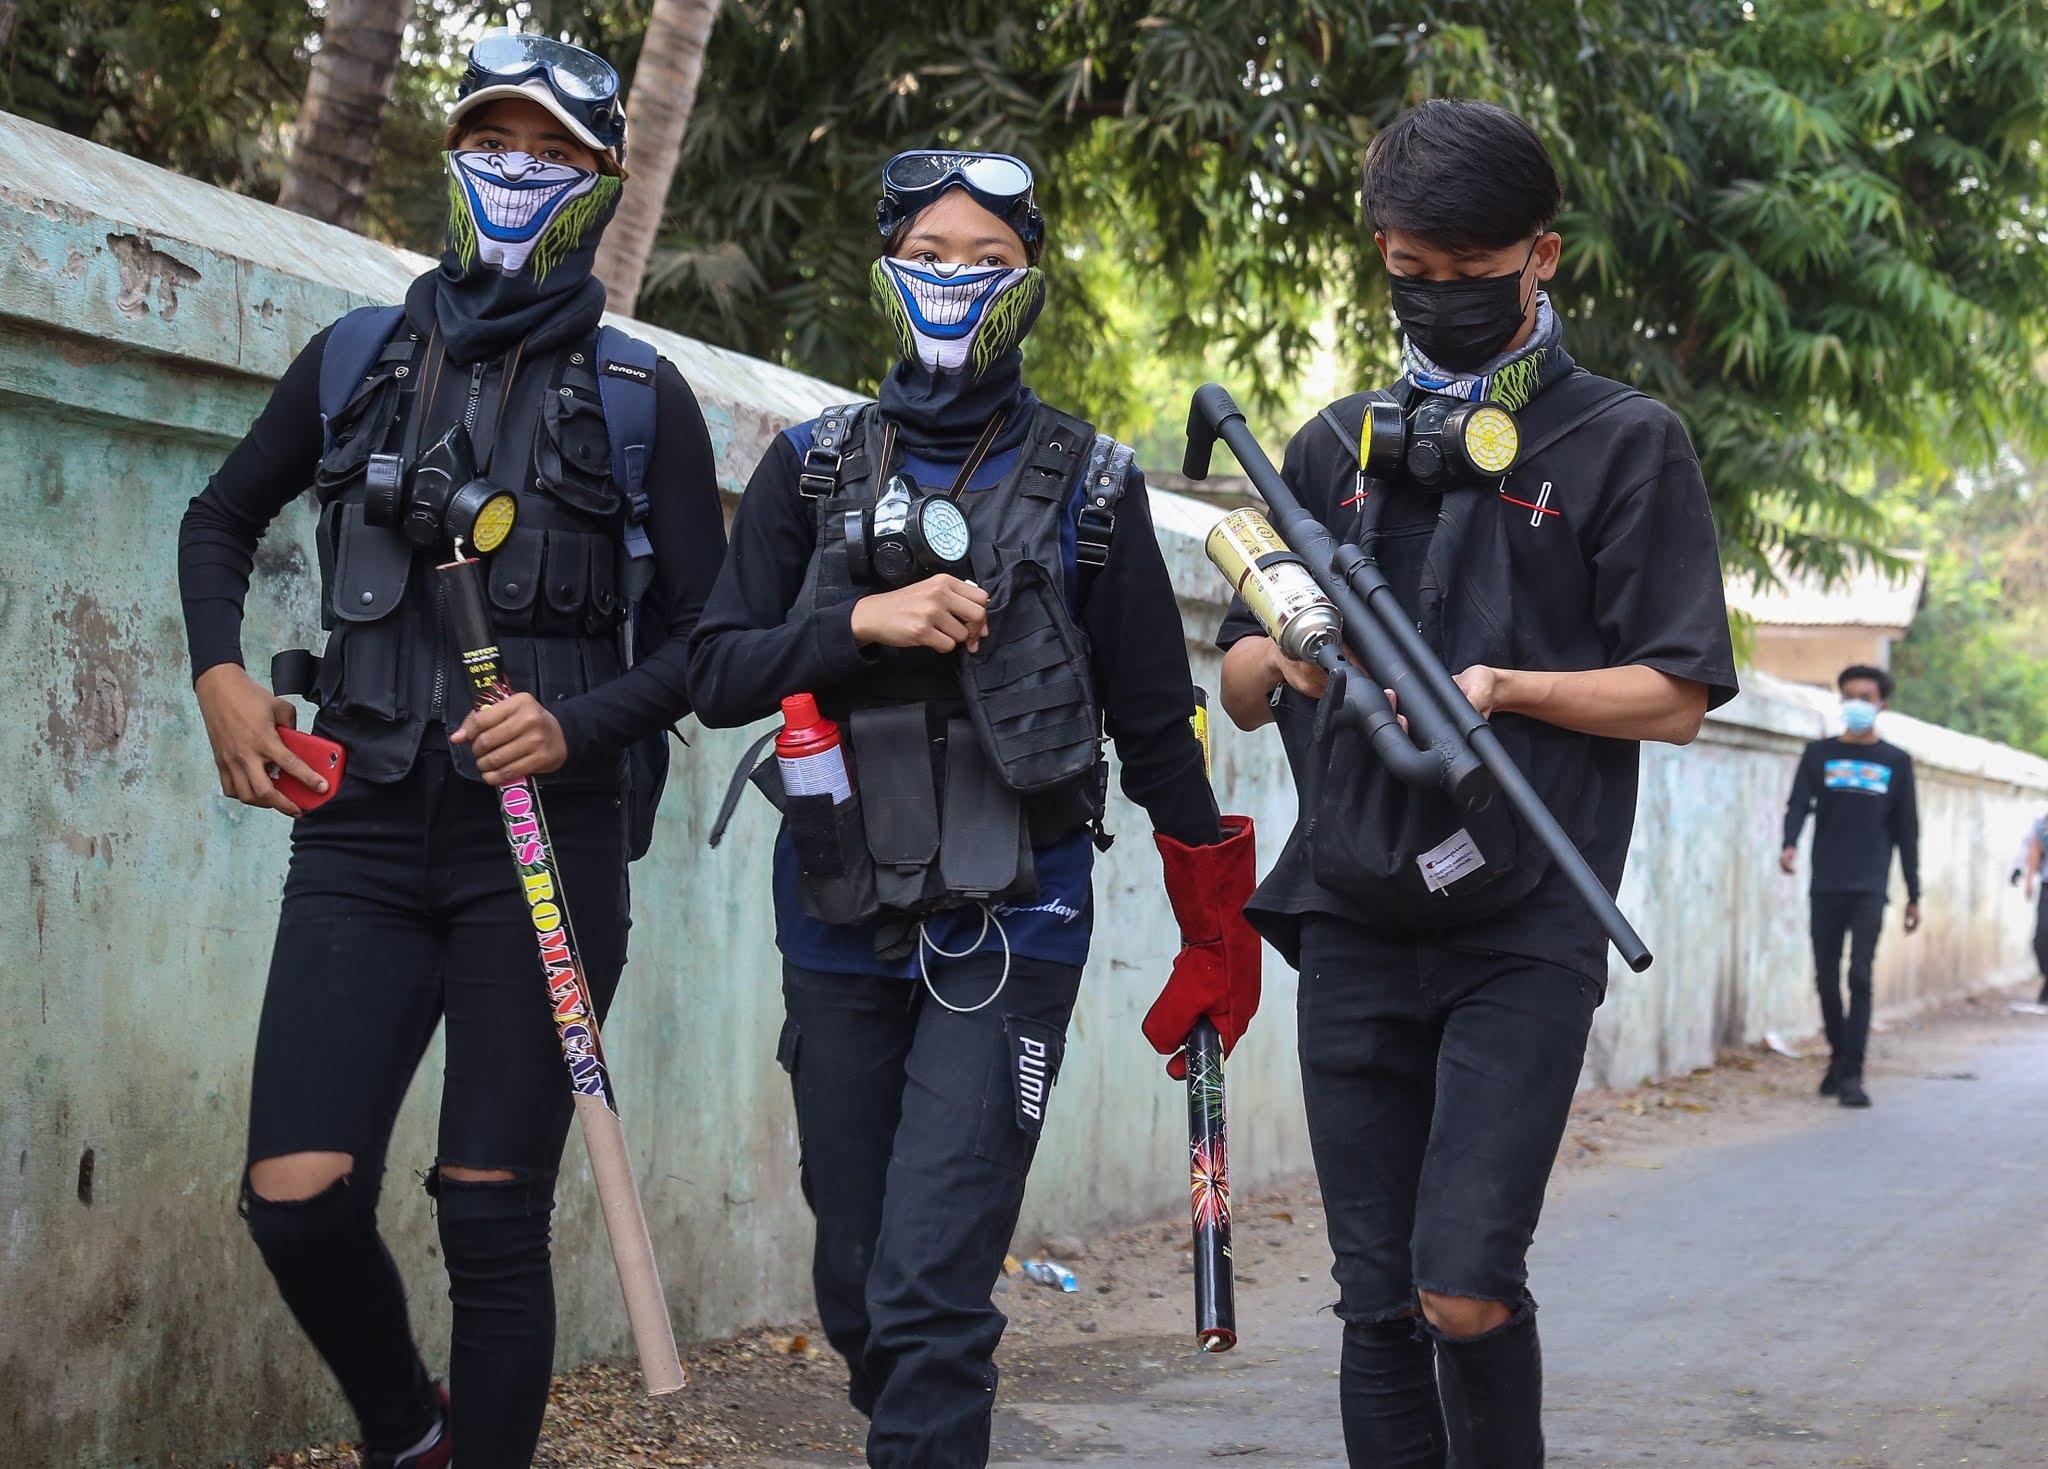 Birmania: rebeldes inician ataque contra militares